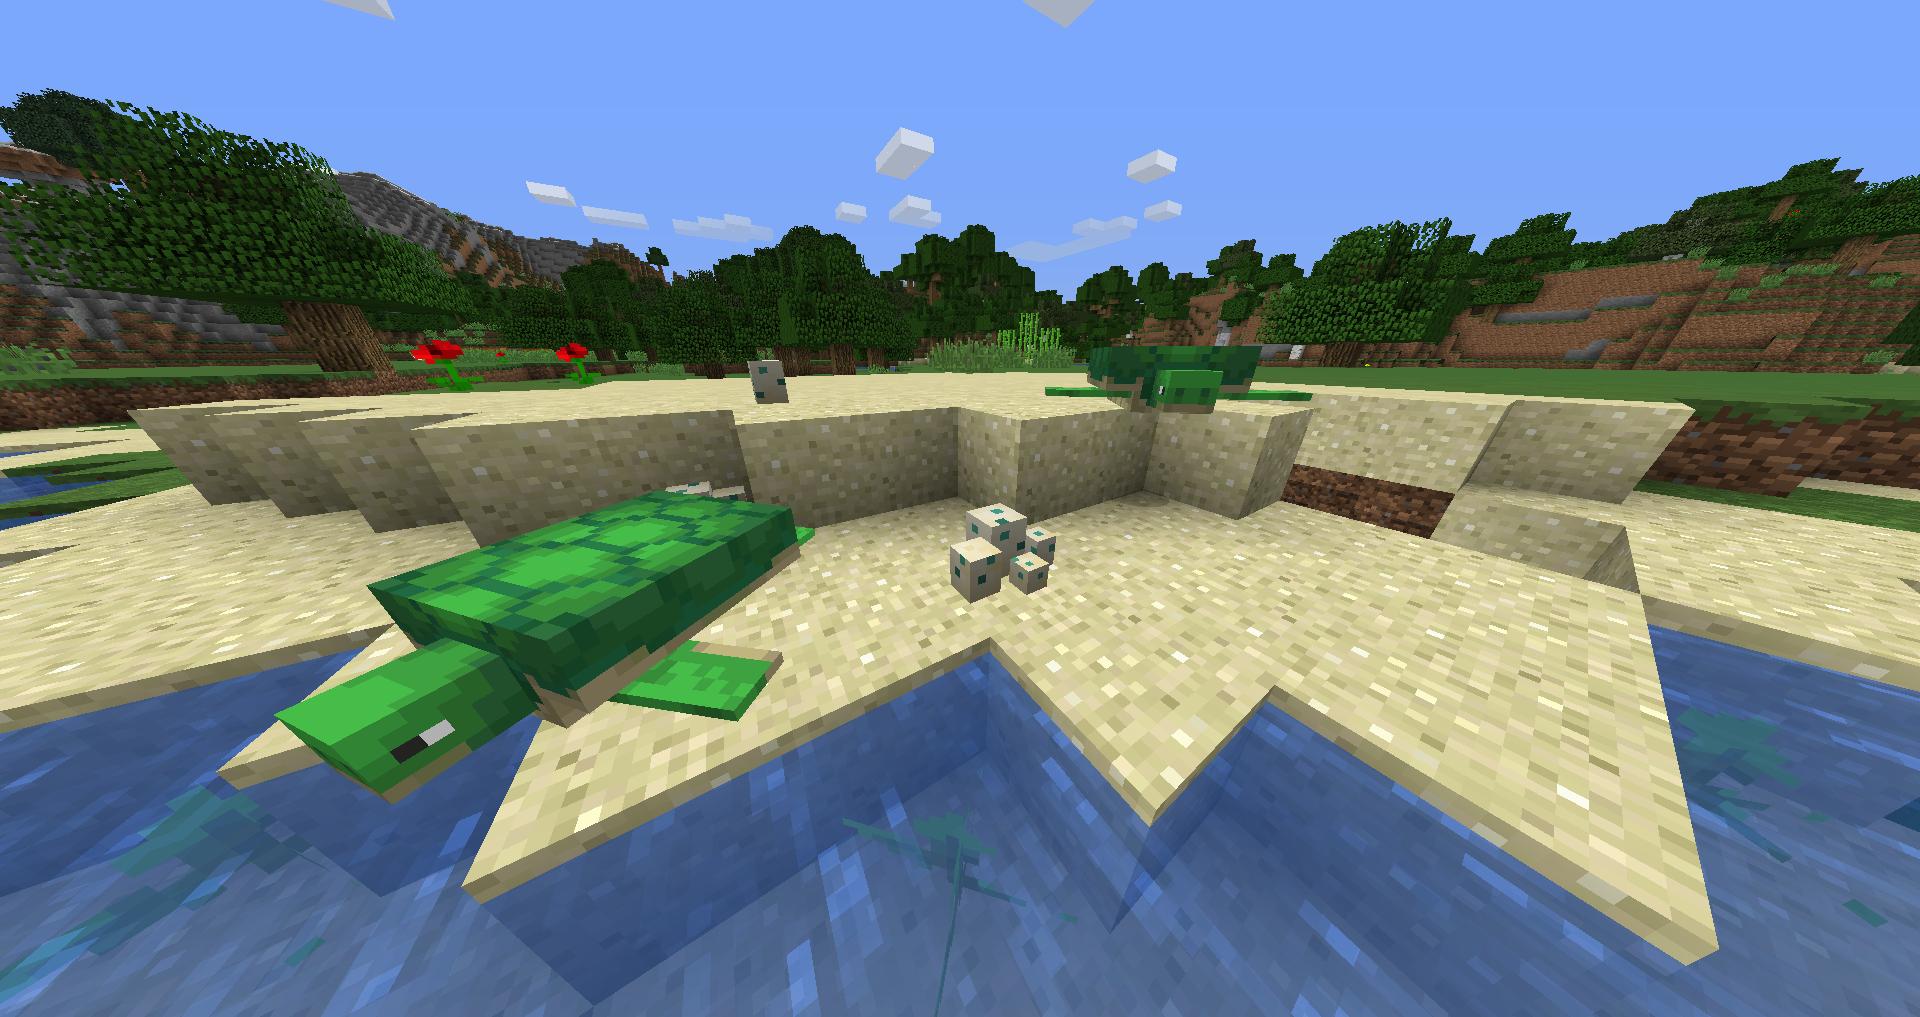 Aquatic Update Minecraft 113 Minecraftfr